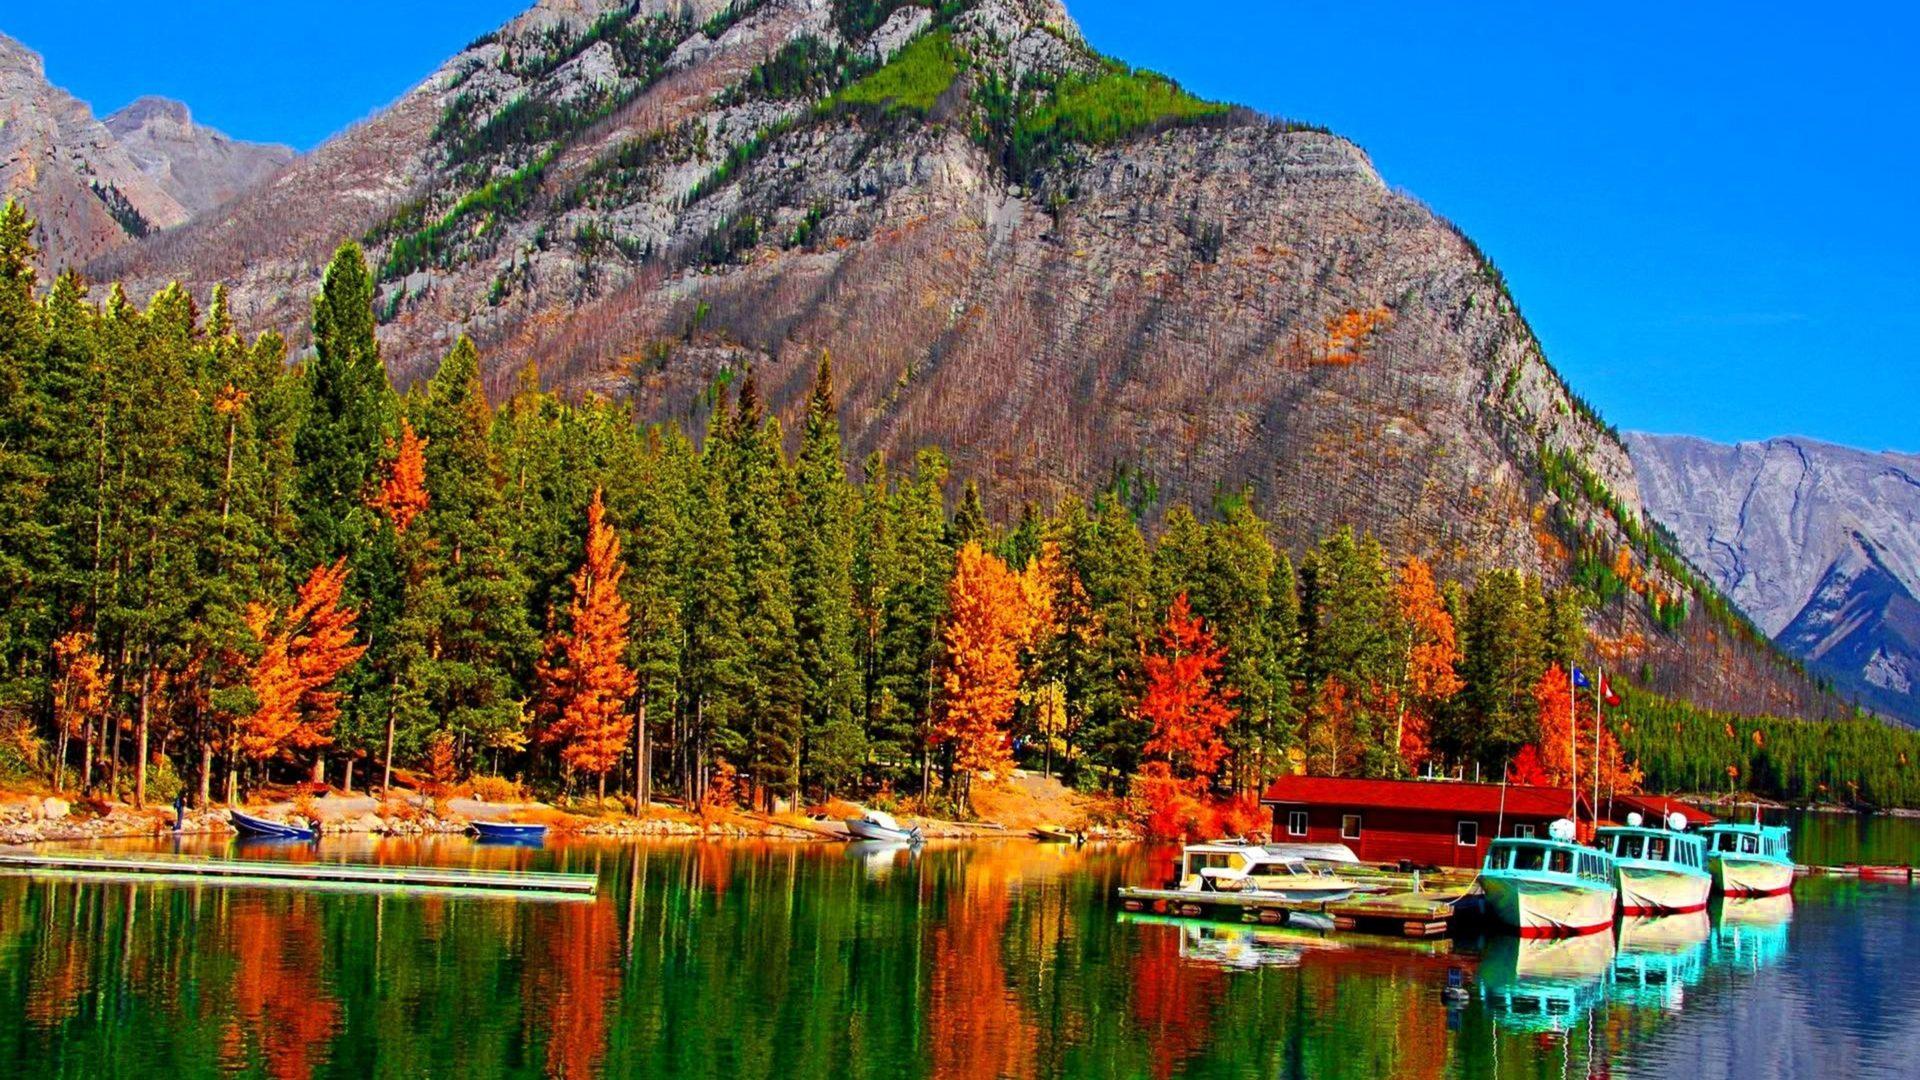 Fall Foliage Deskt Op Wallpaper Fall Colors On Lake Banff In Canada Boats Hd Wallpaper